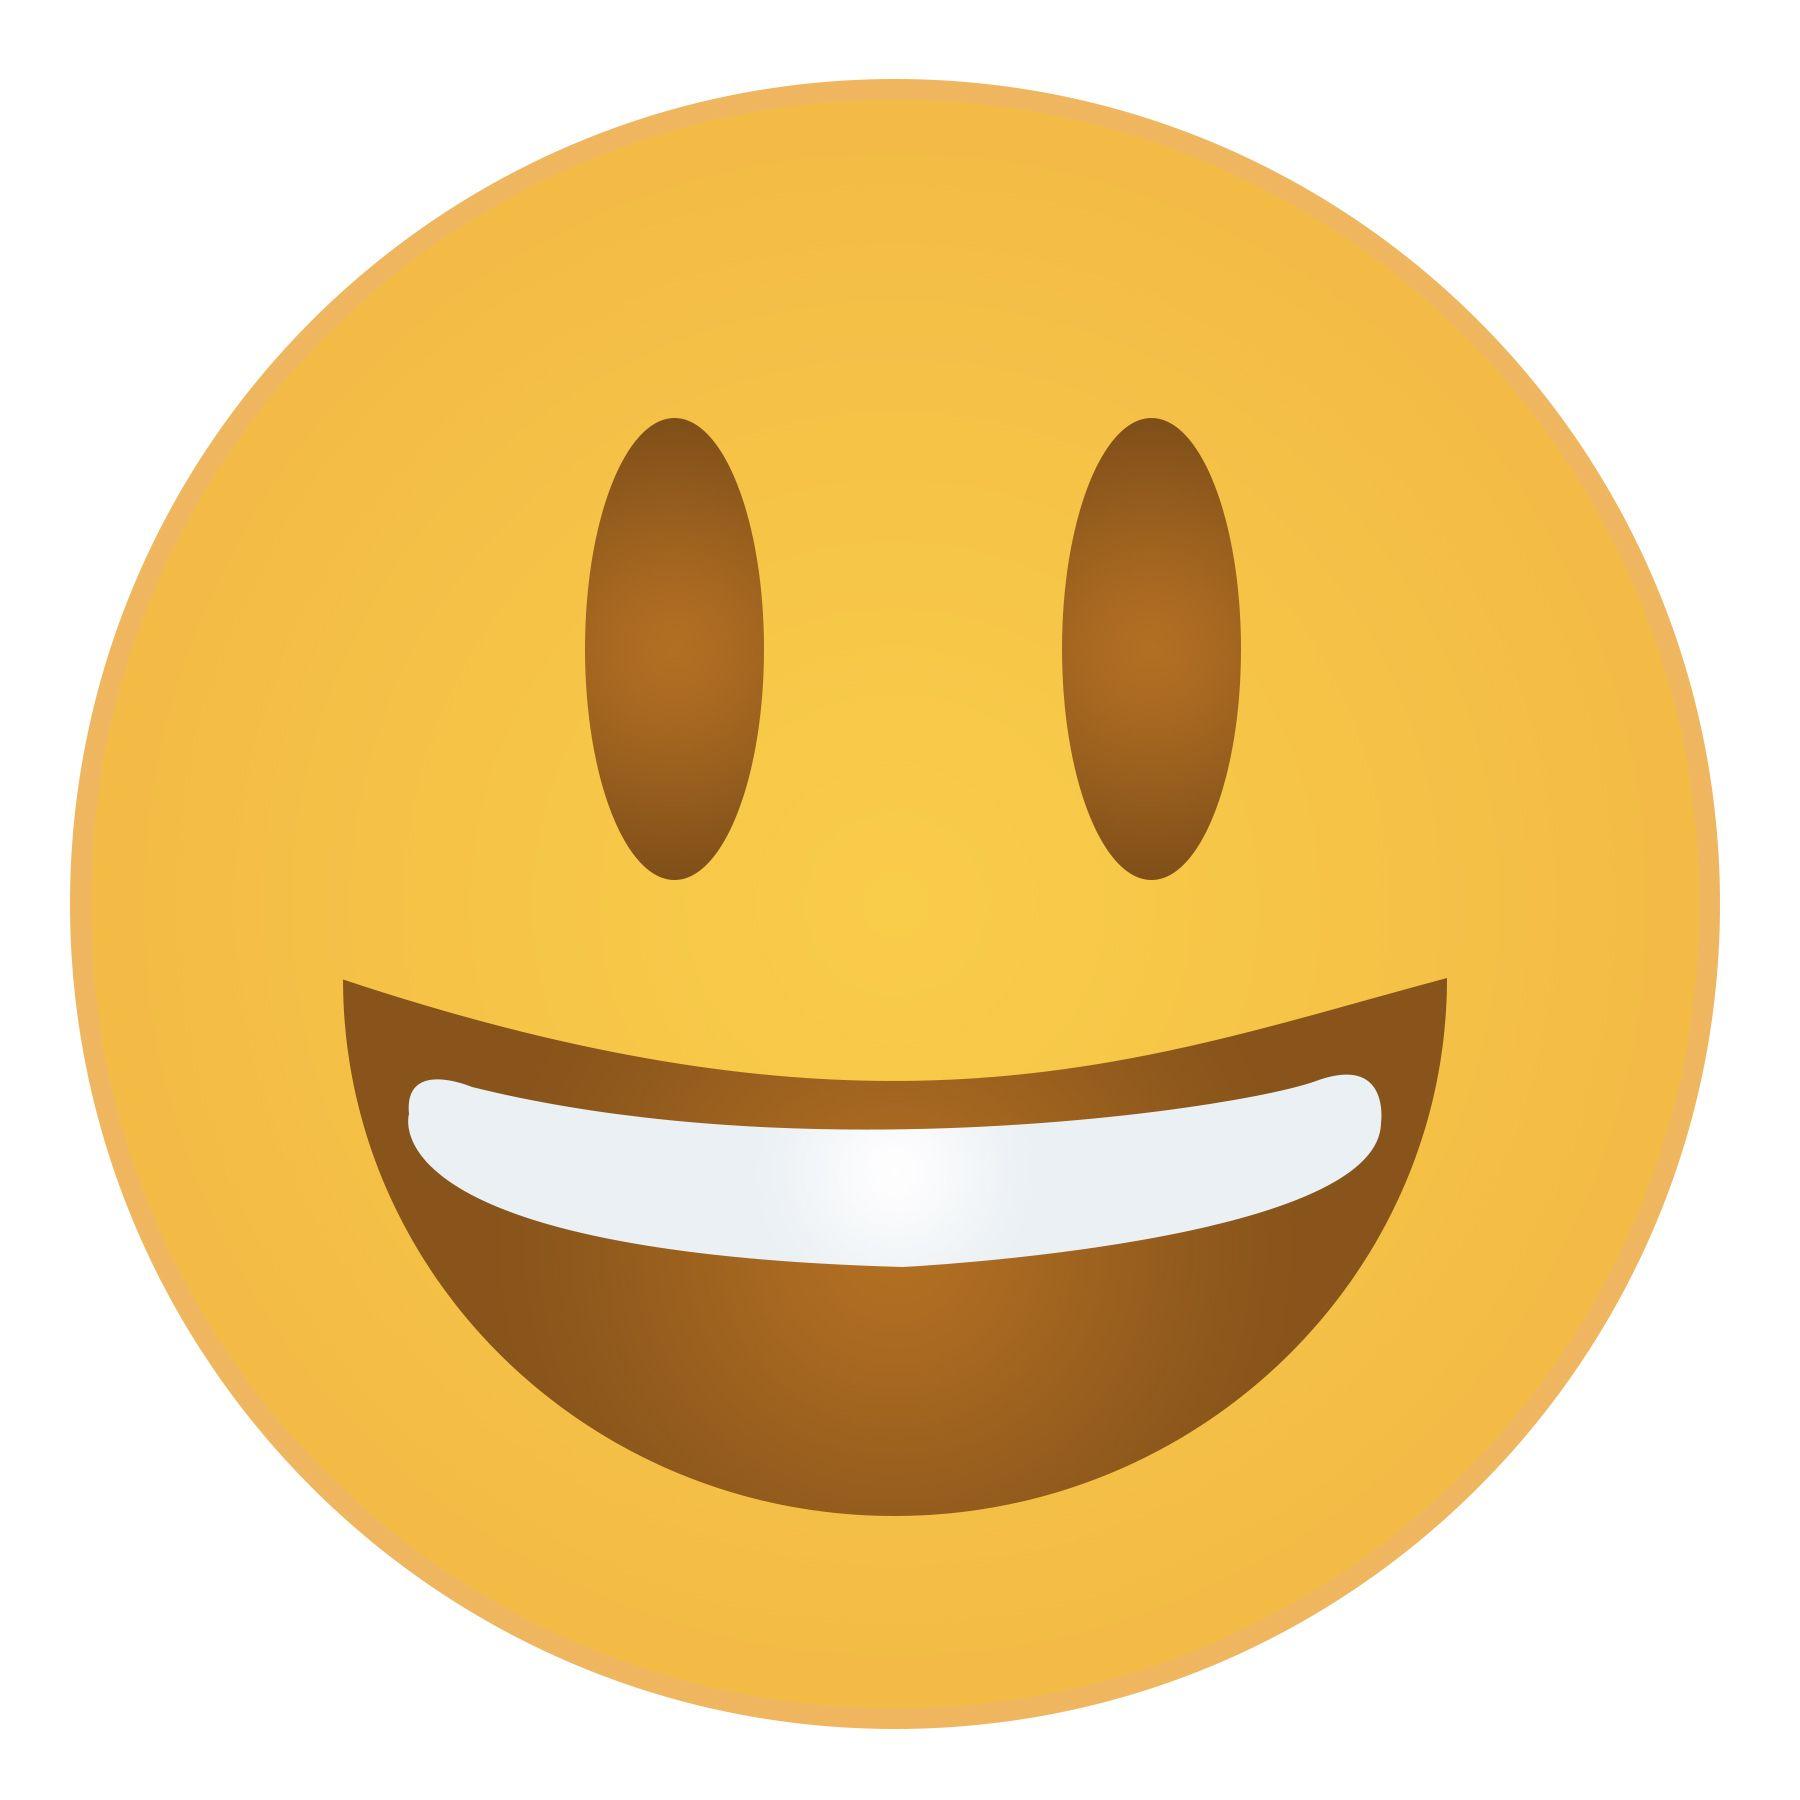 Free Printable Emoji Faces - Printable  | Emoji In 2019 - Free Printable Sad Faces